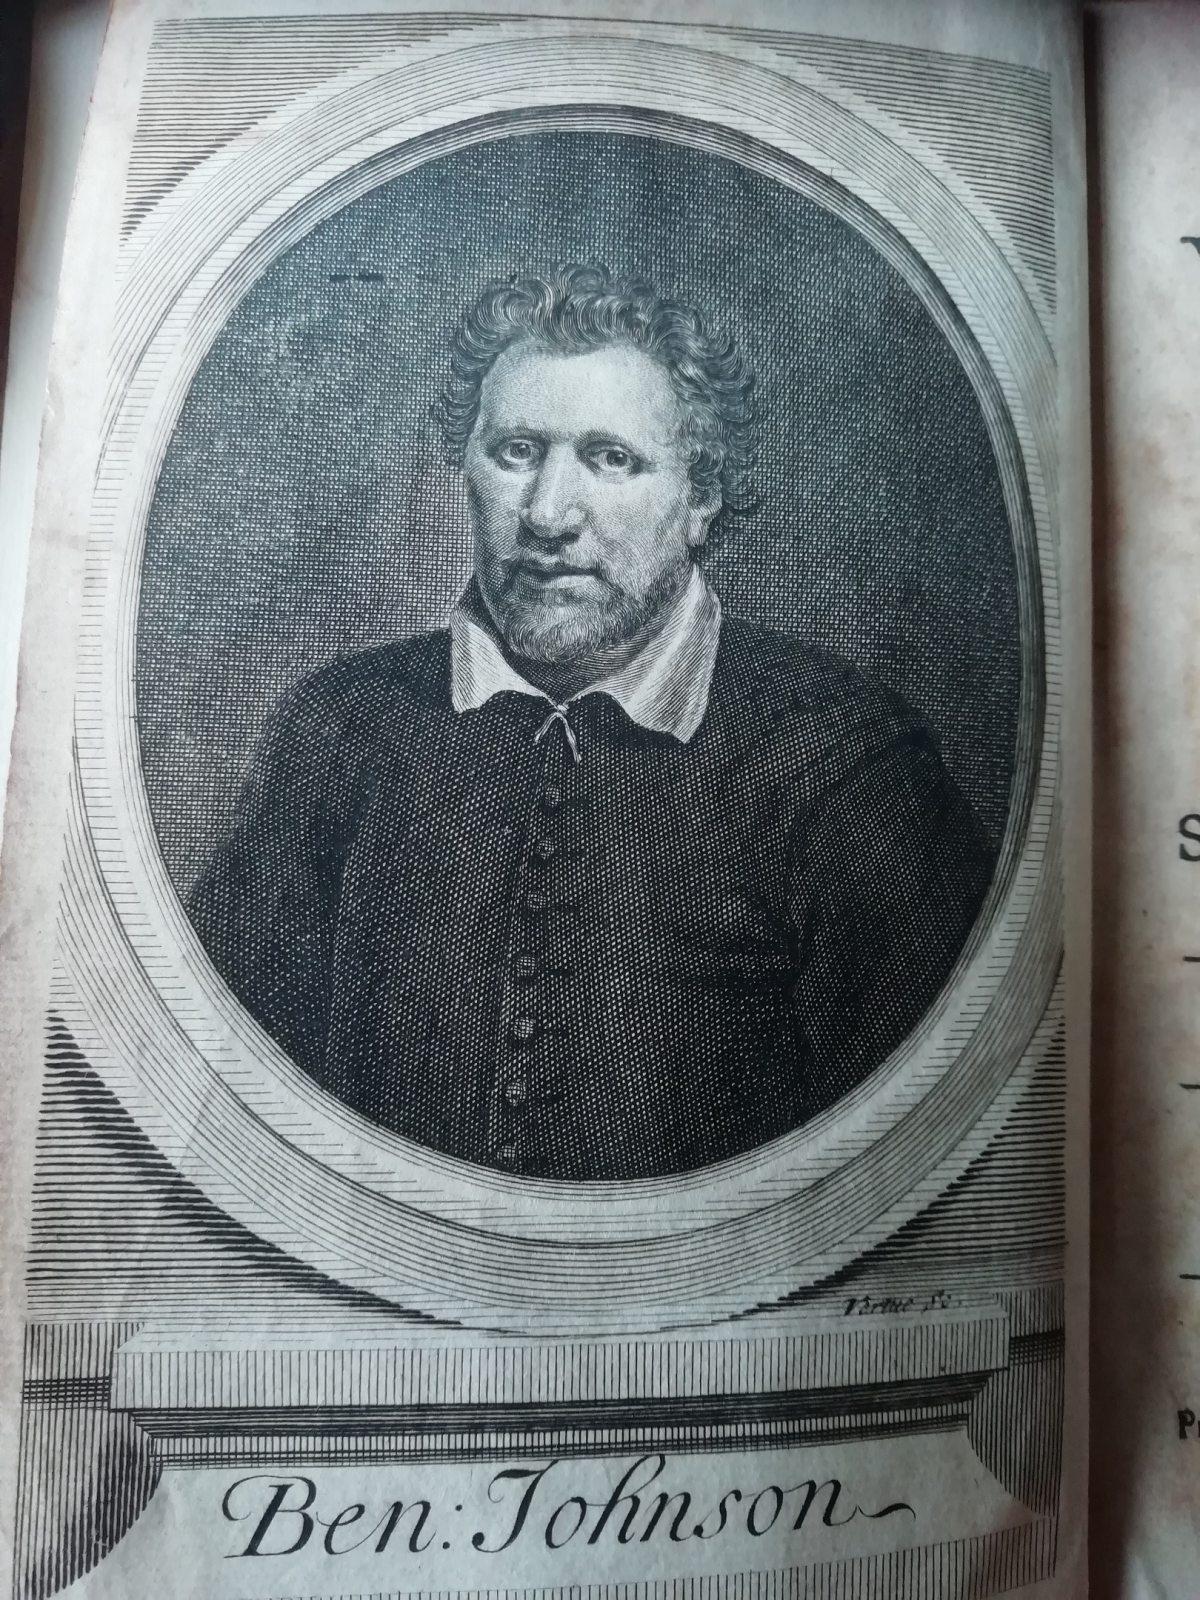 Ben Johnson portrait